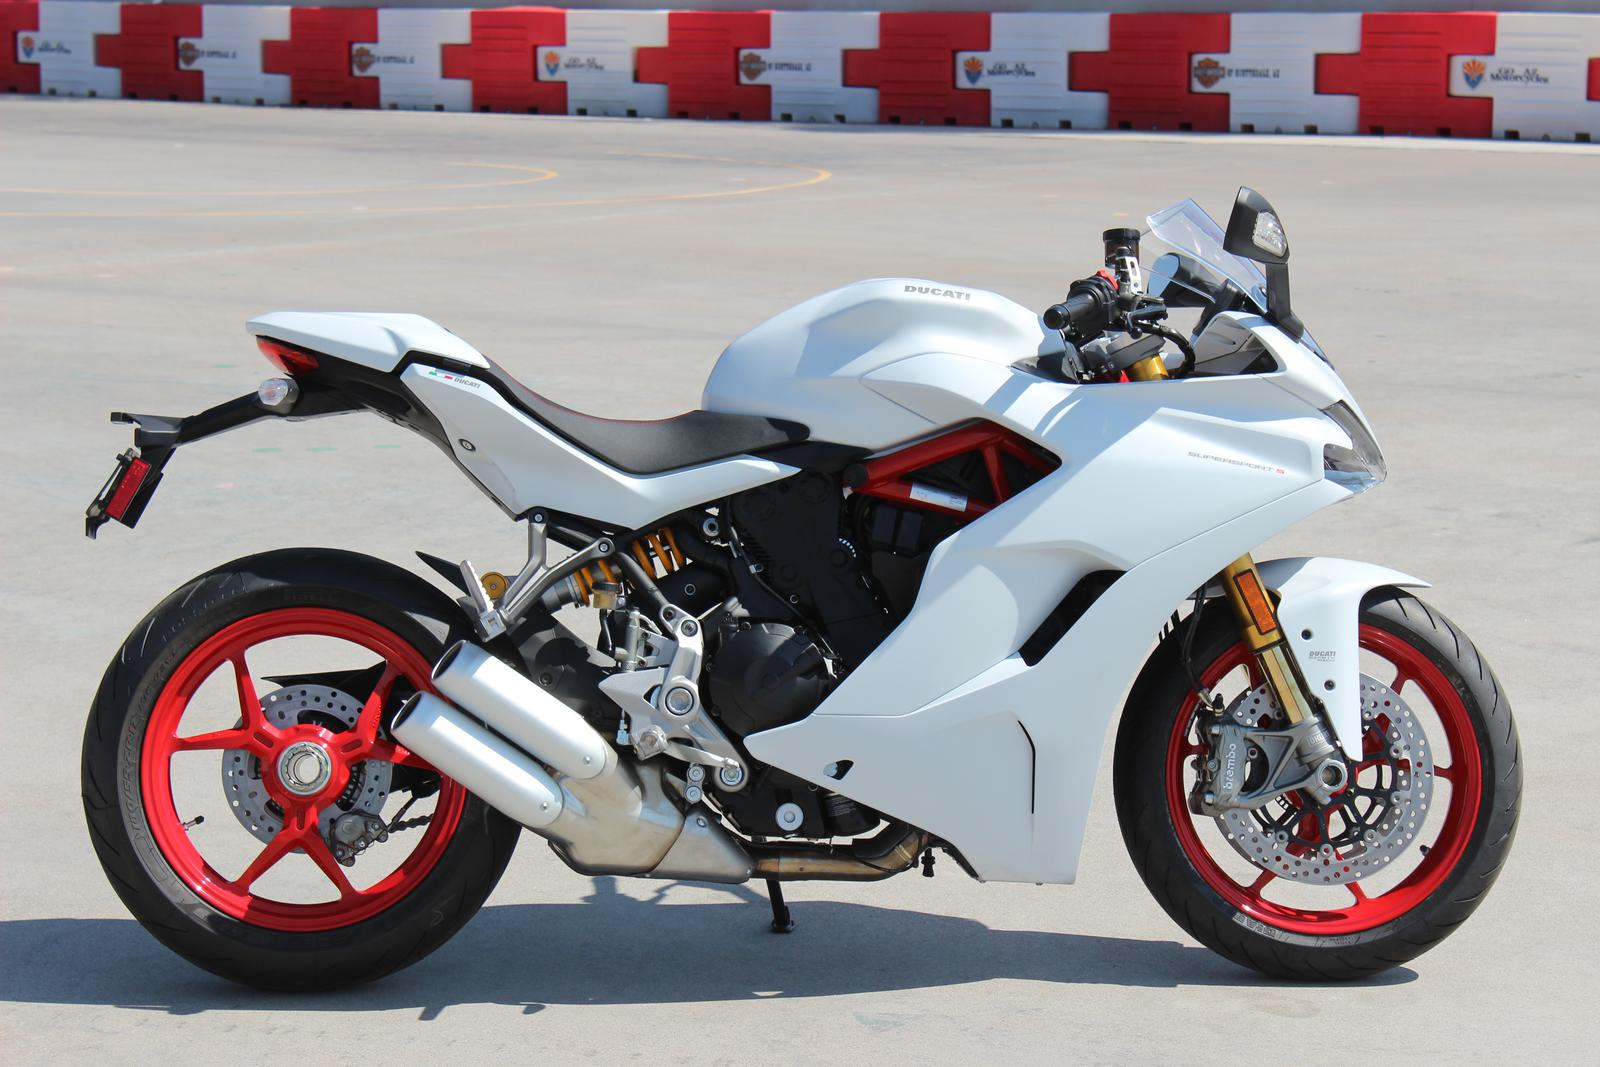 Ducati Supersport S Star White Silk For Sale In Scottsdale Az Go Az Motorcycles In Scottsdale